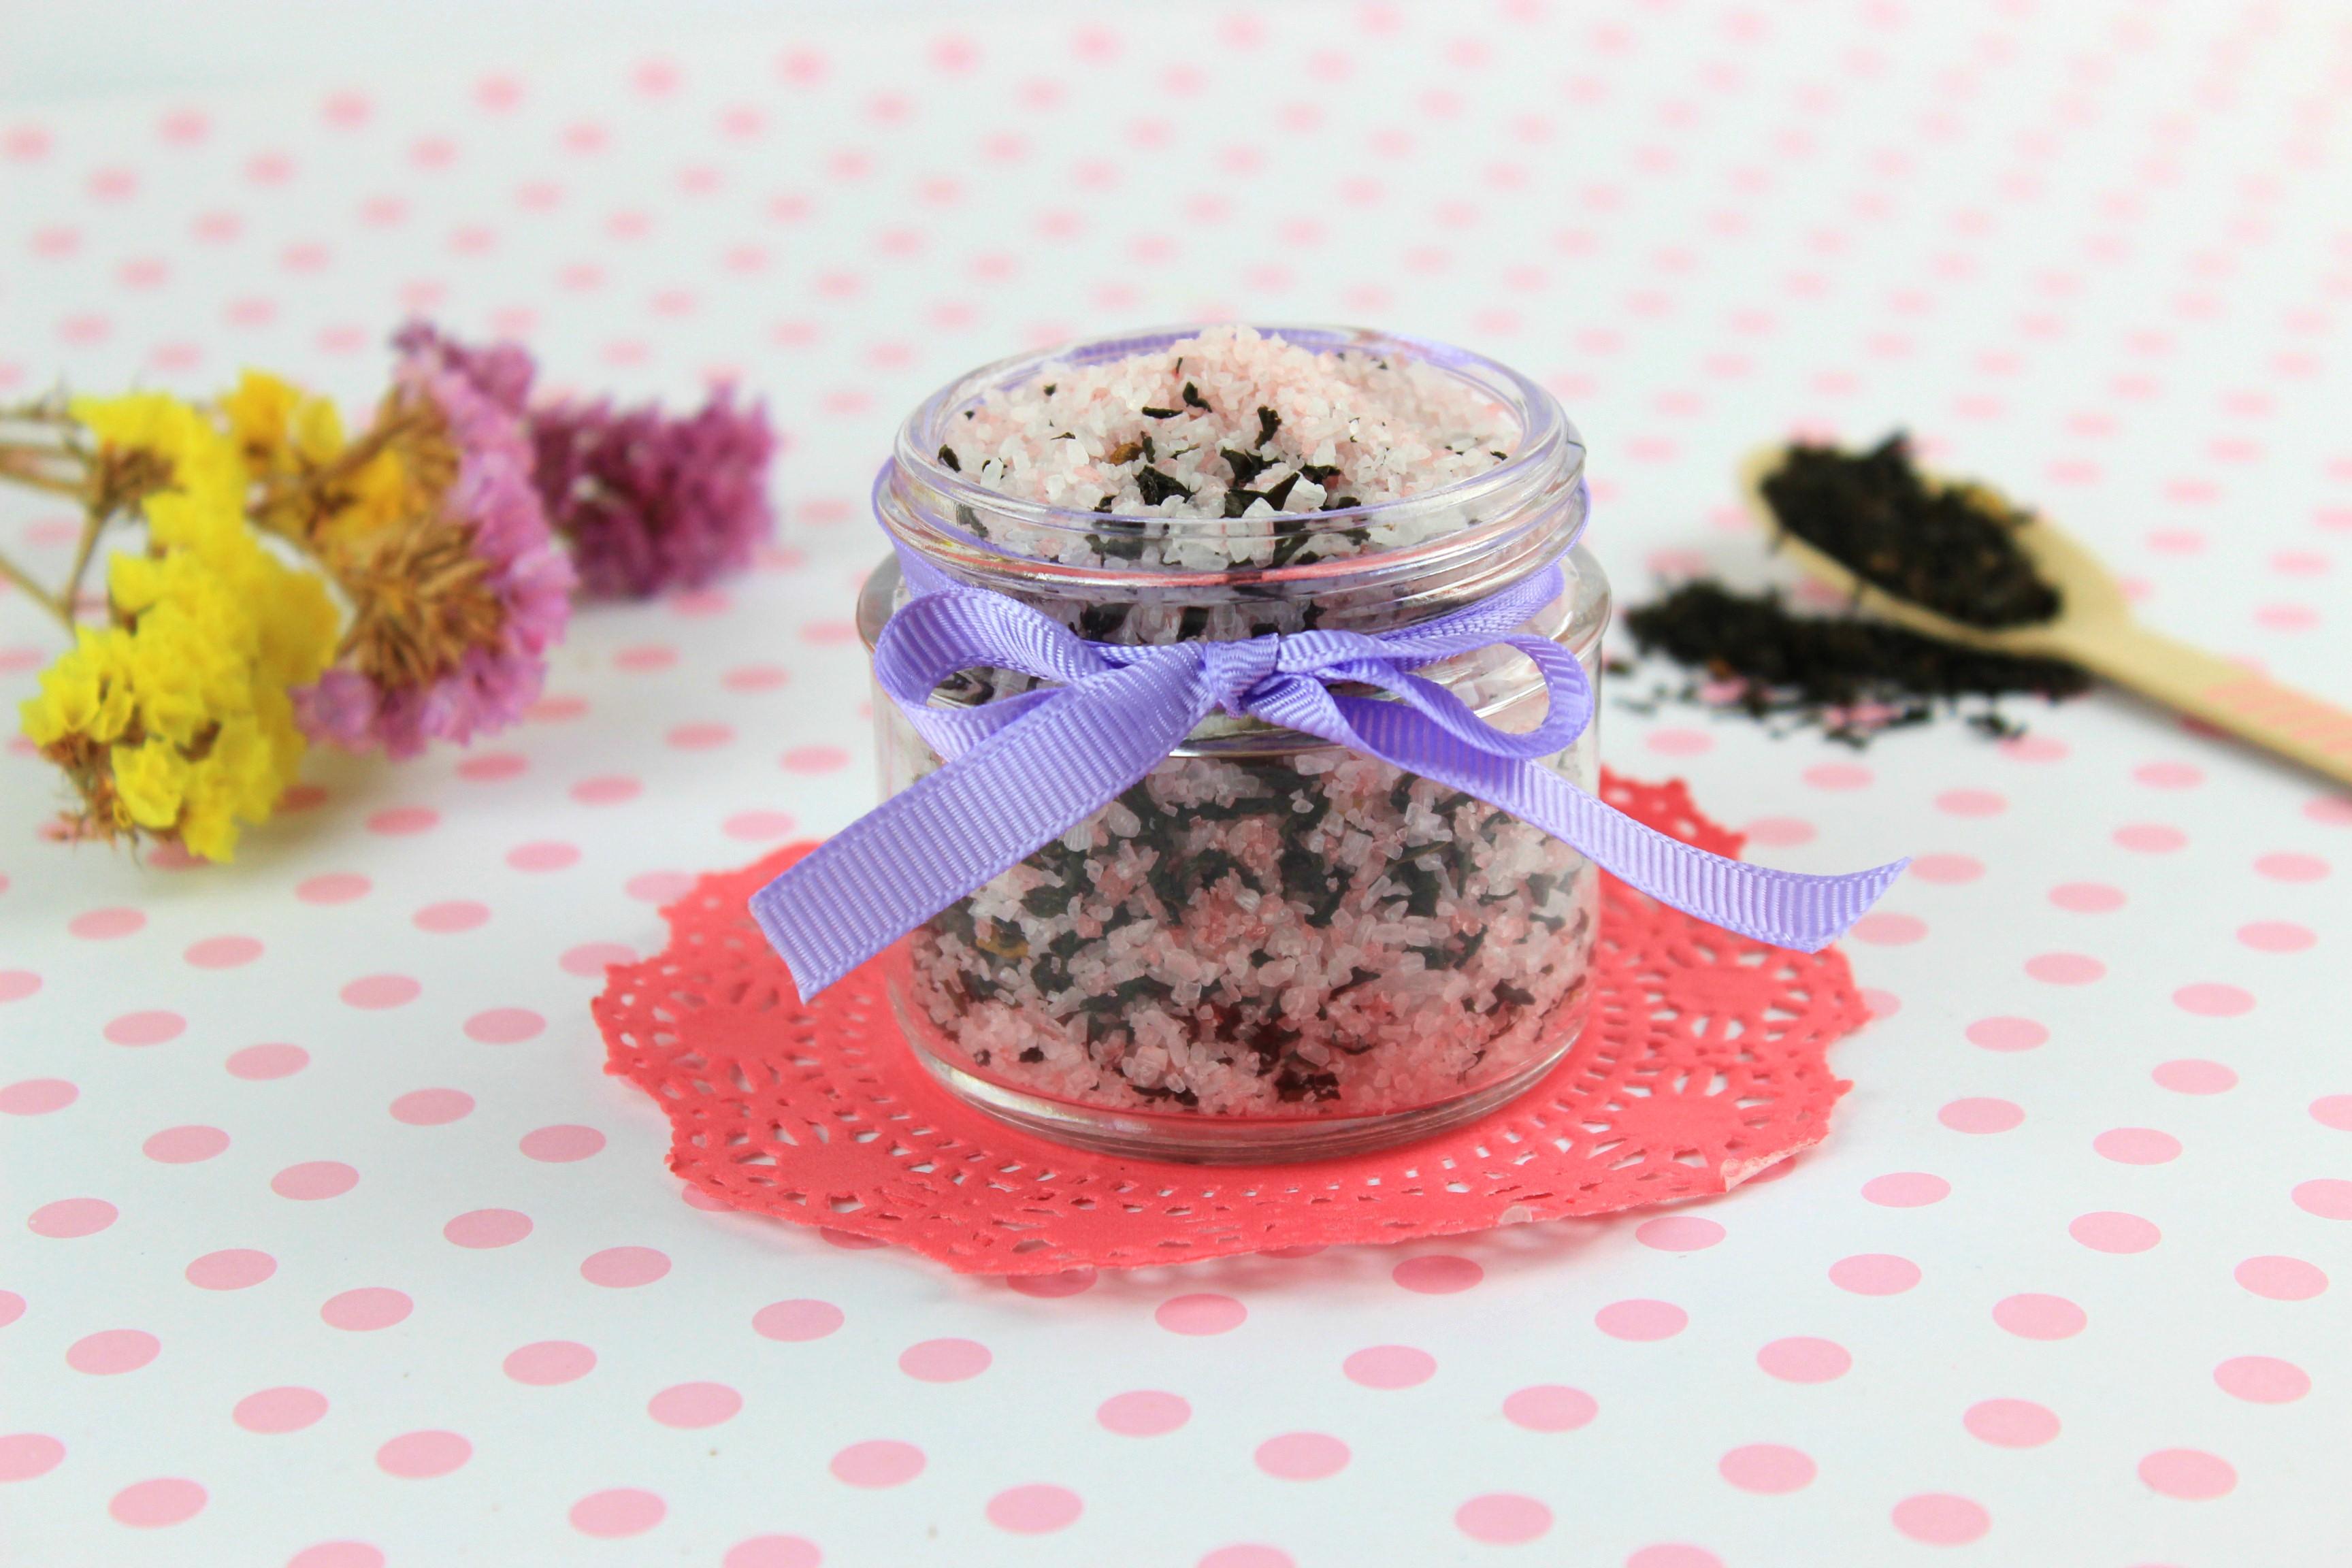 Aromatic Bath Salts